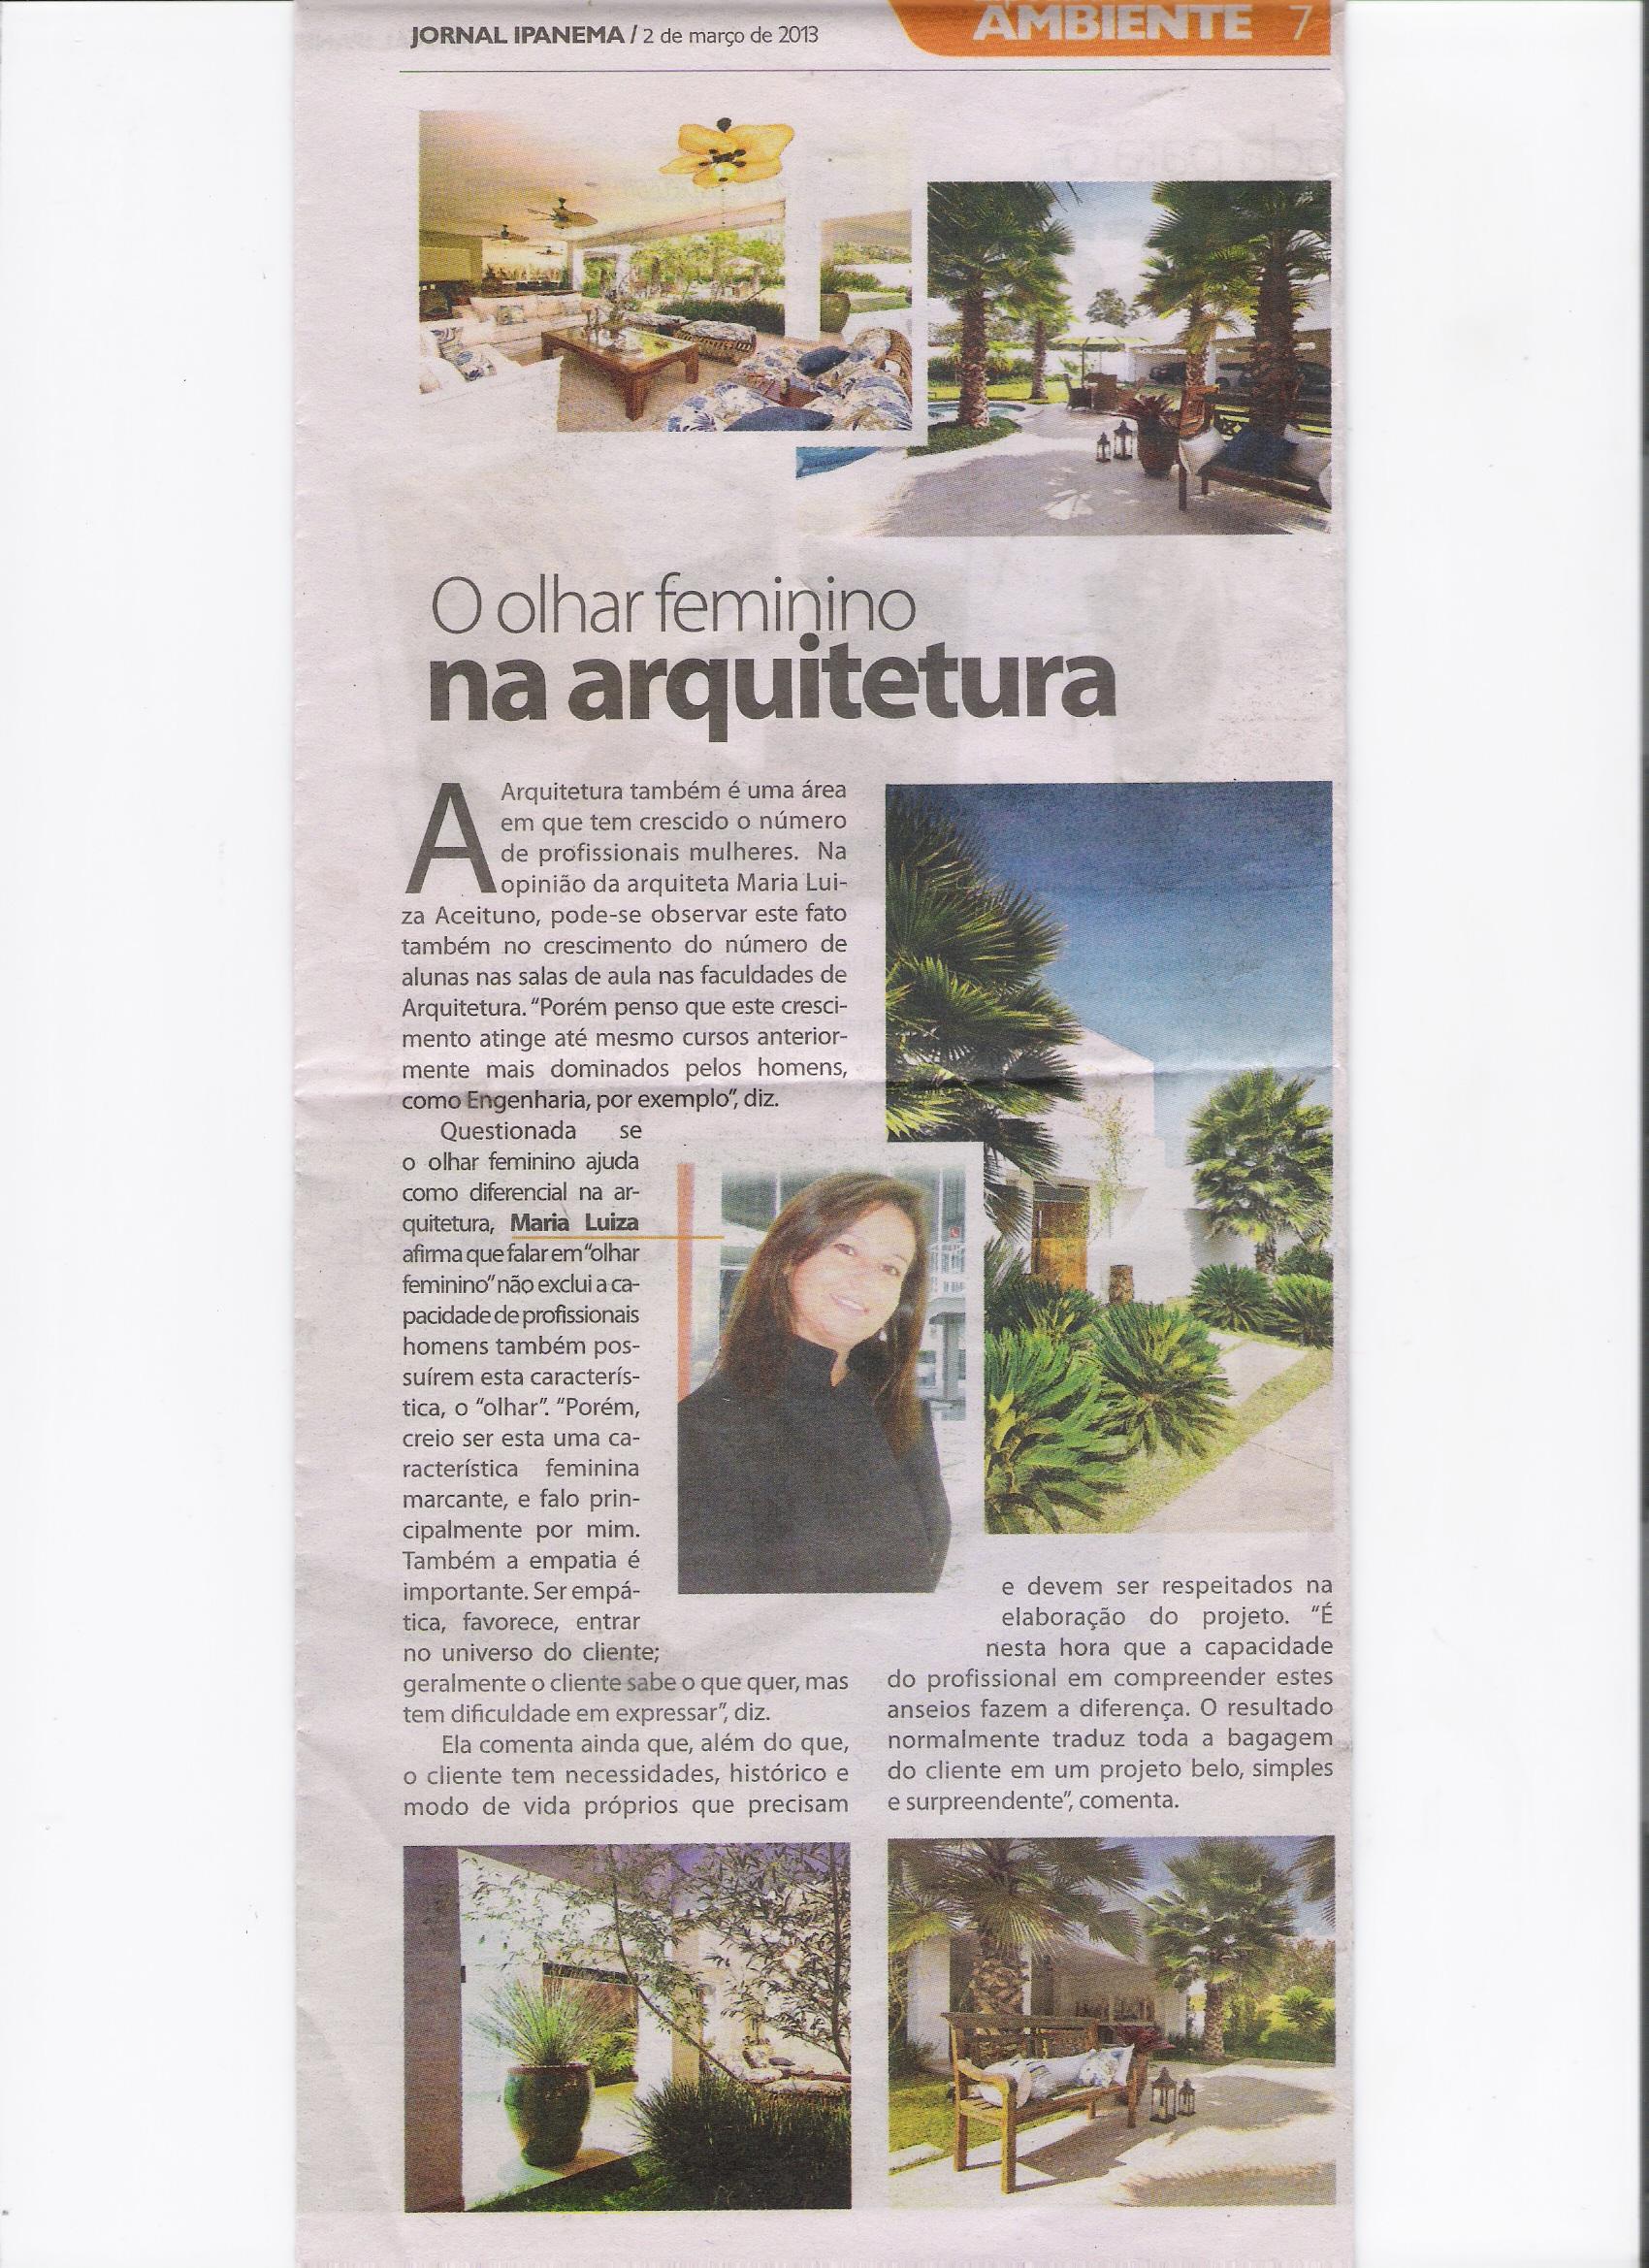 Materia 02-03-2013 Jornal Ipanema.jpg